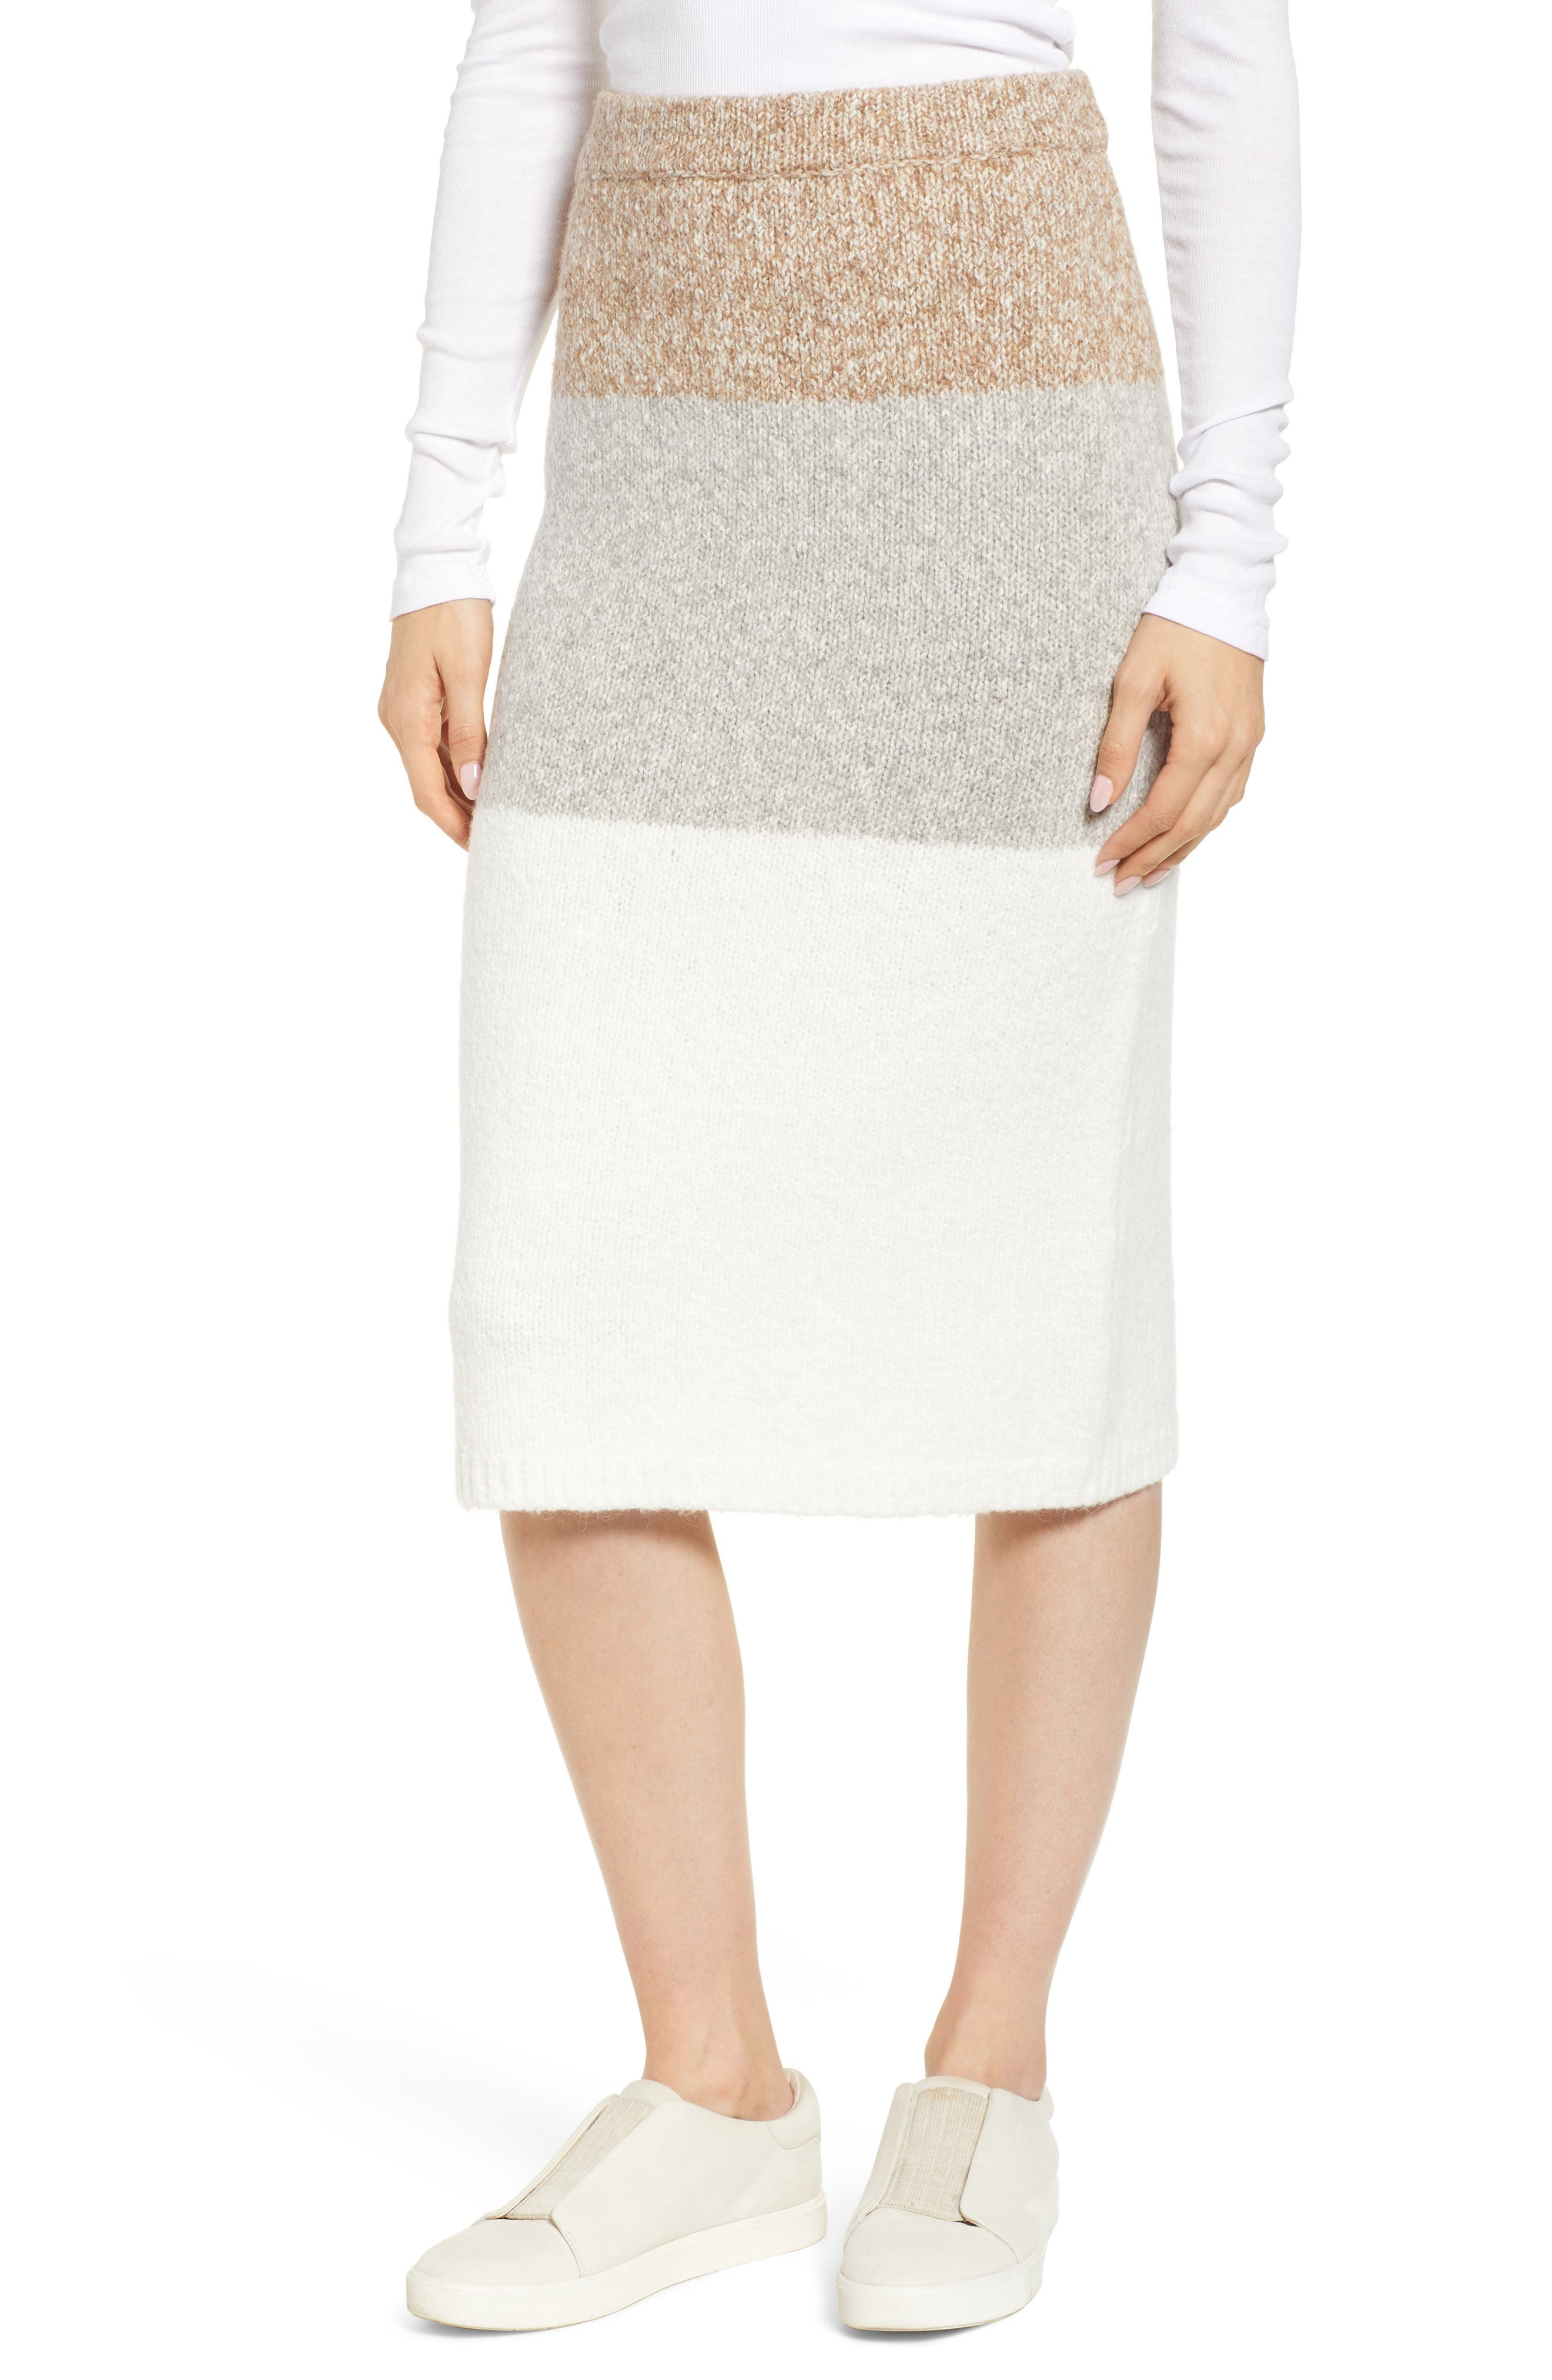 LOU & GREY Stripemarl Sweater Skirt, Main, color, IVORY